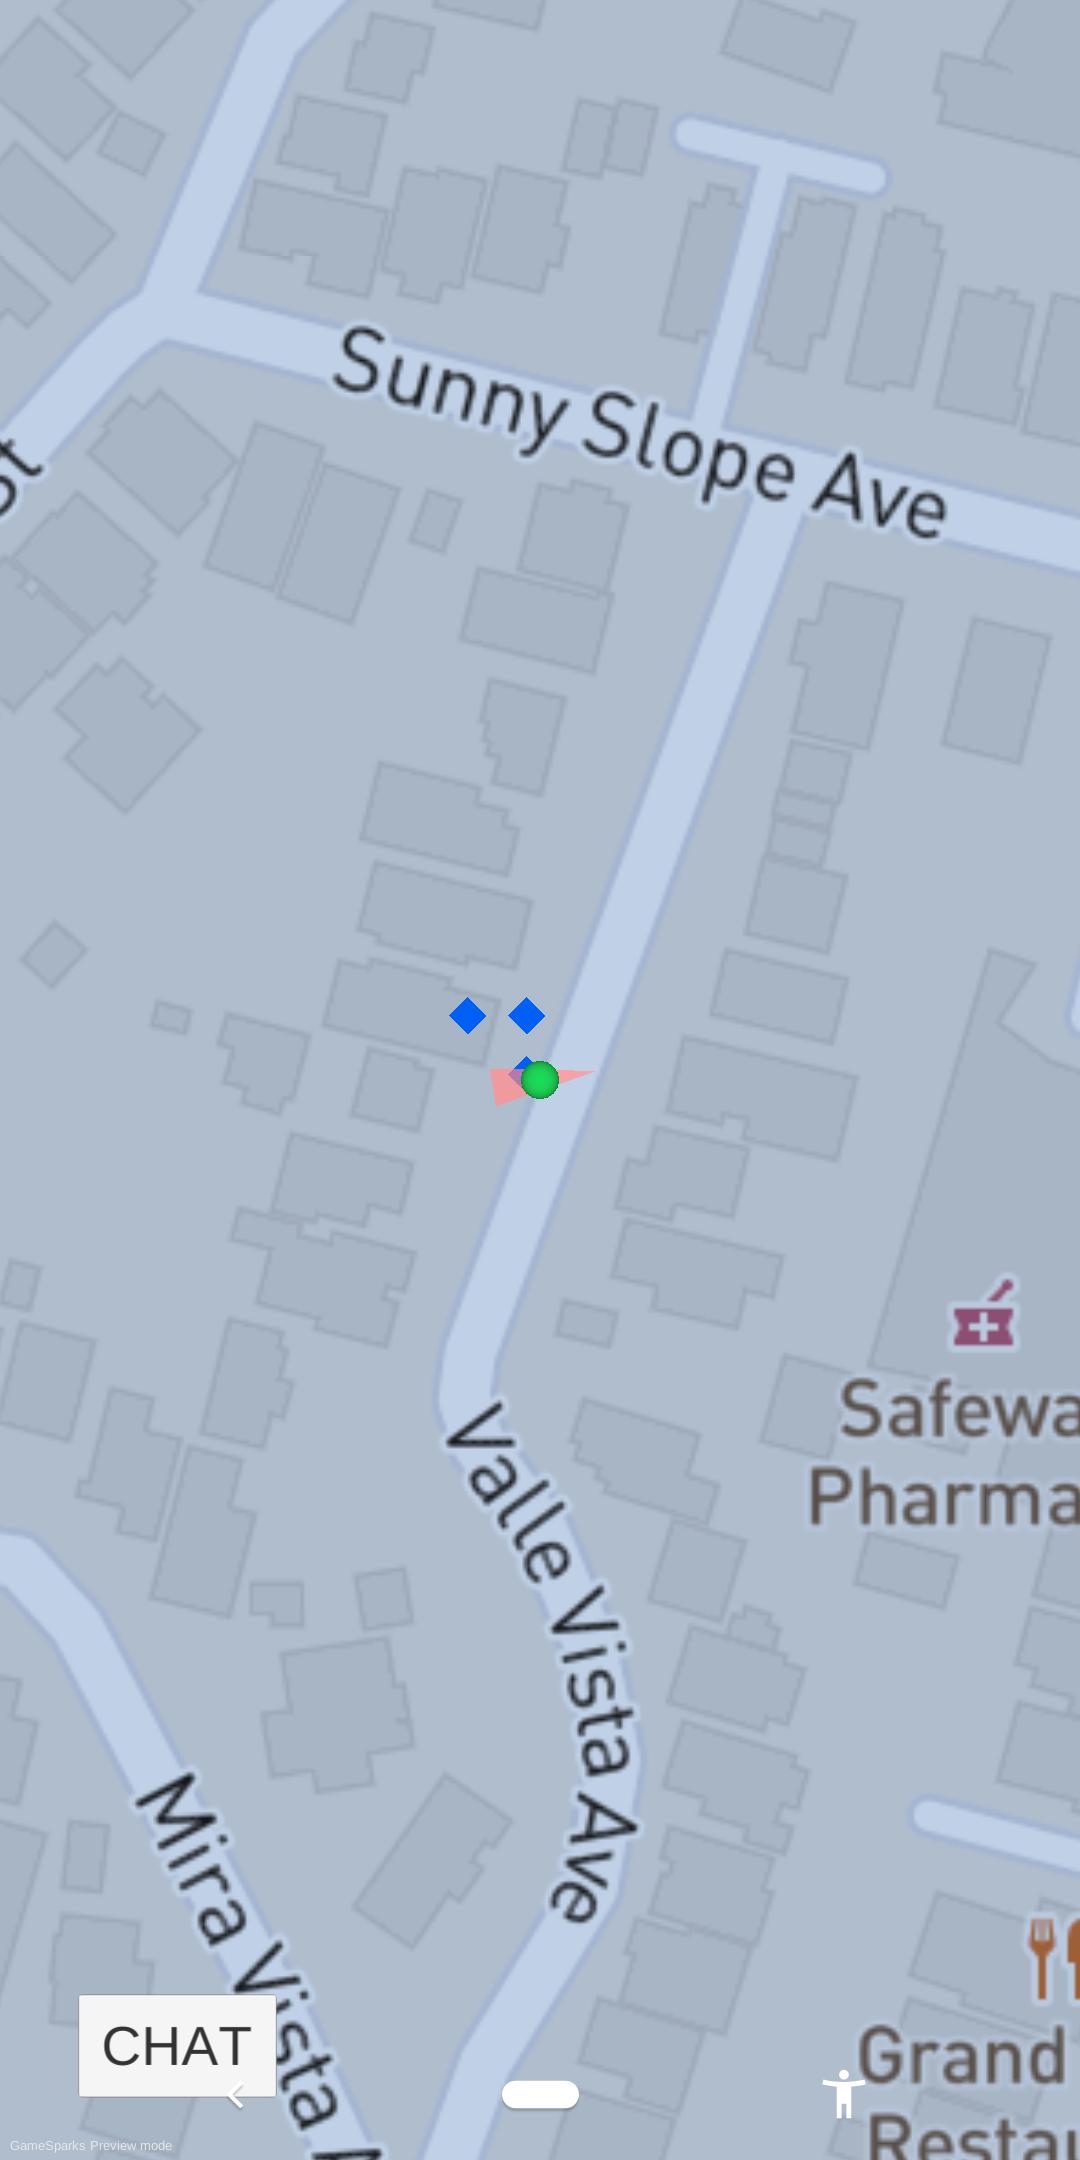 Location based AR